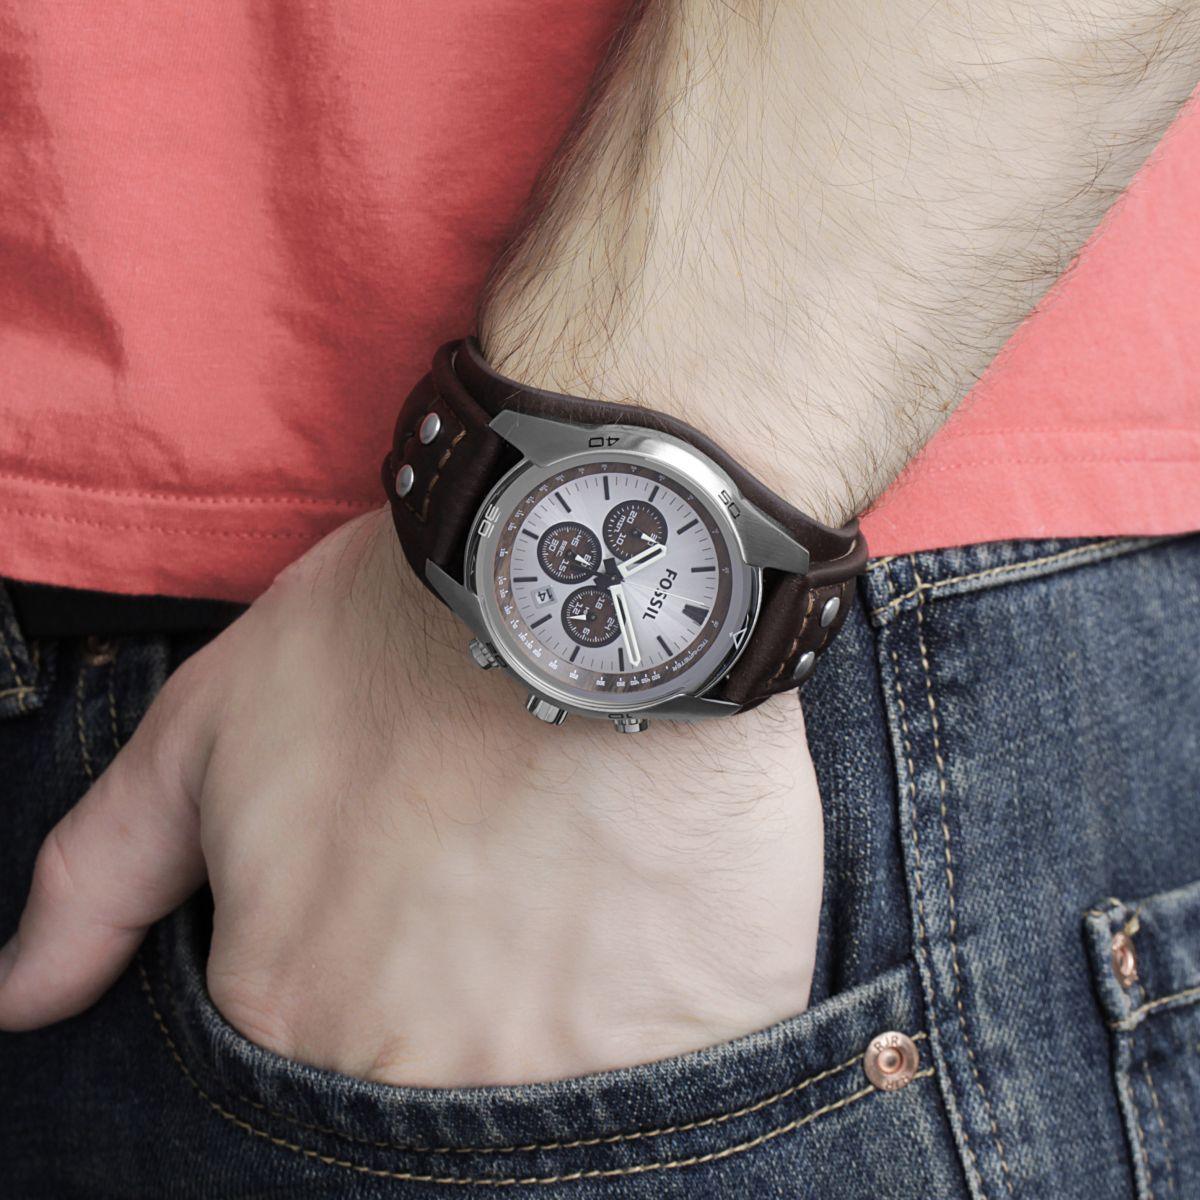 Hommes Fossil Coachman Chronographe Bracelet Rigide Montre